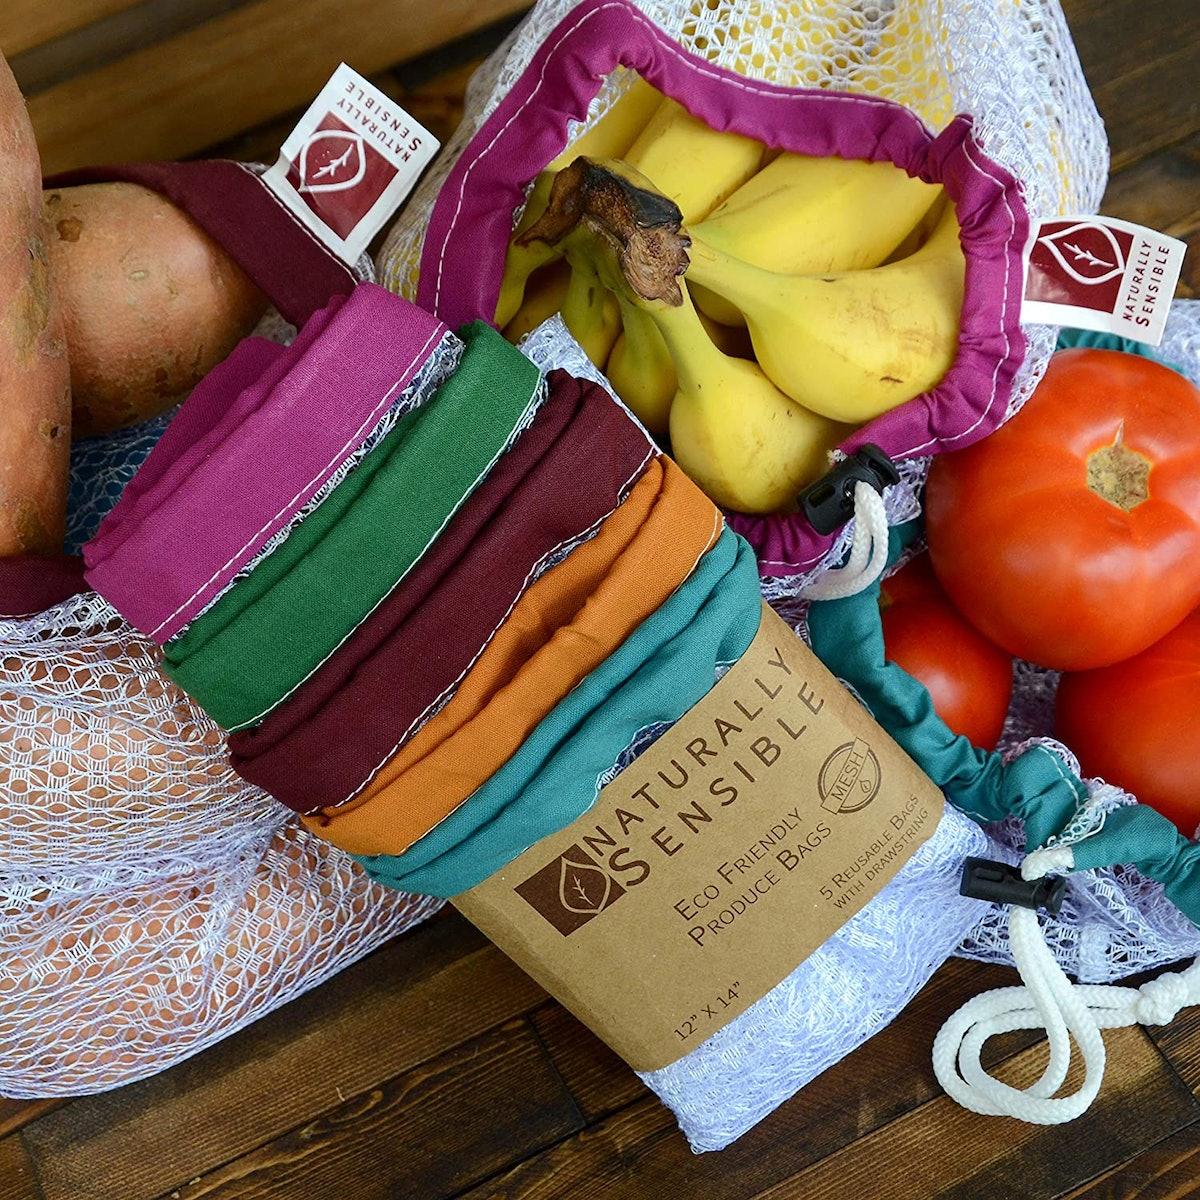 Naturally Sensible Reusable Produce Bags (5-Pack)